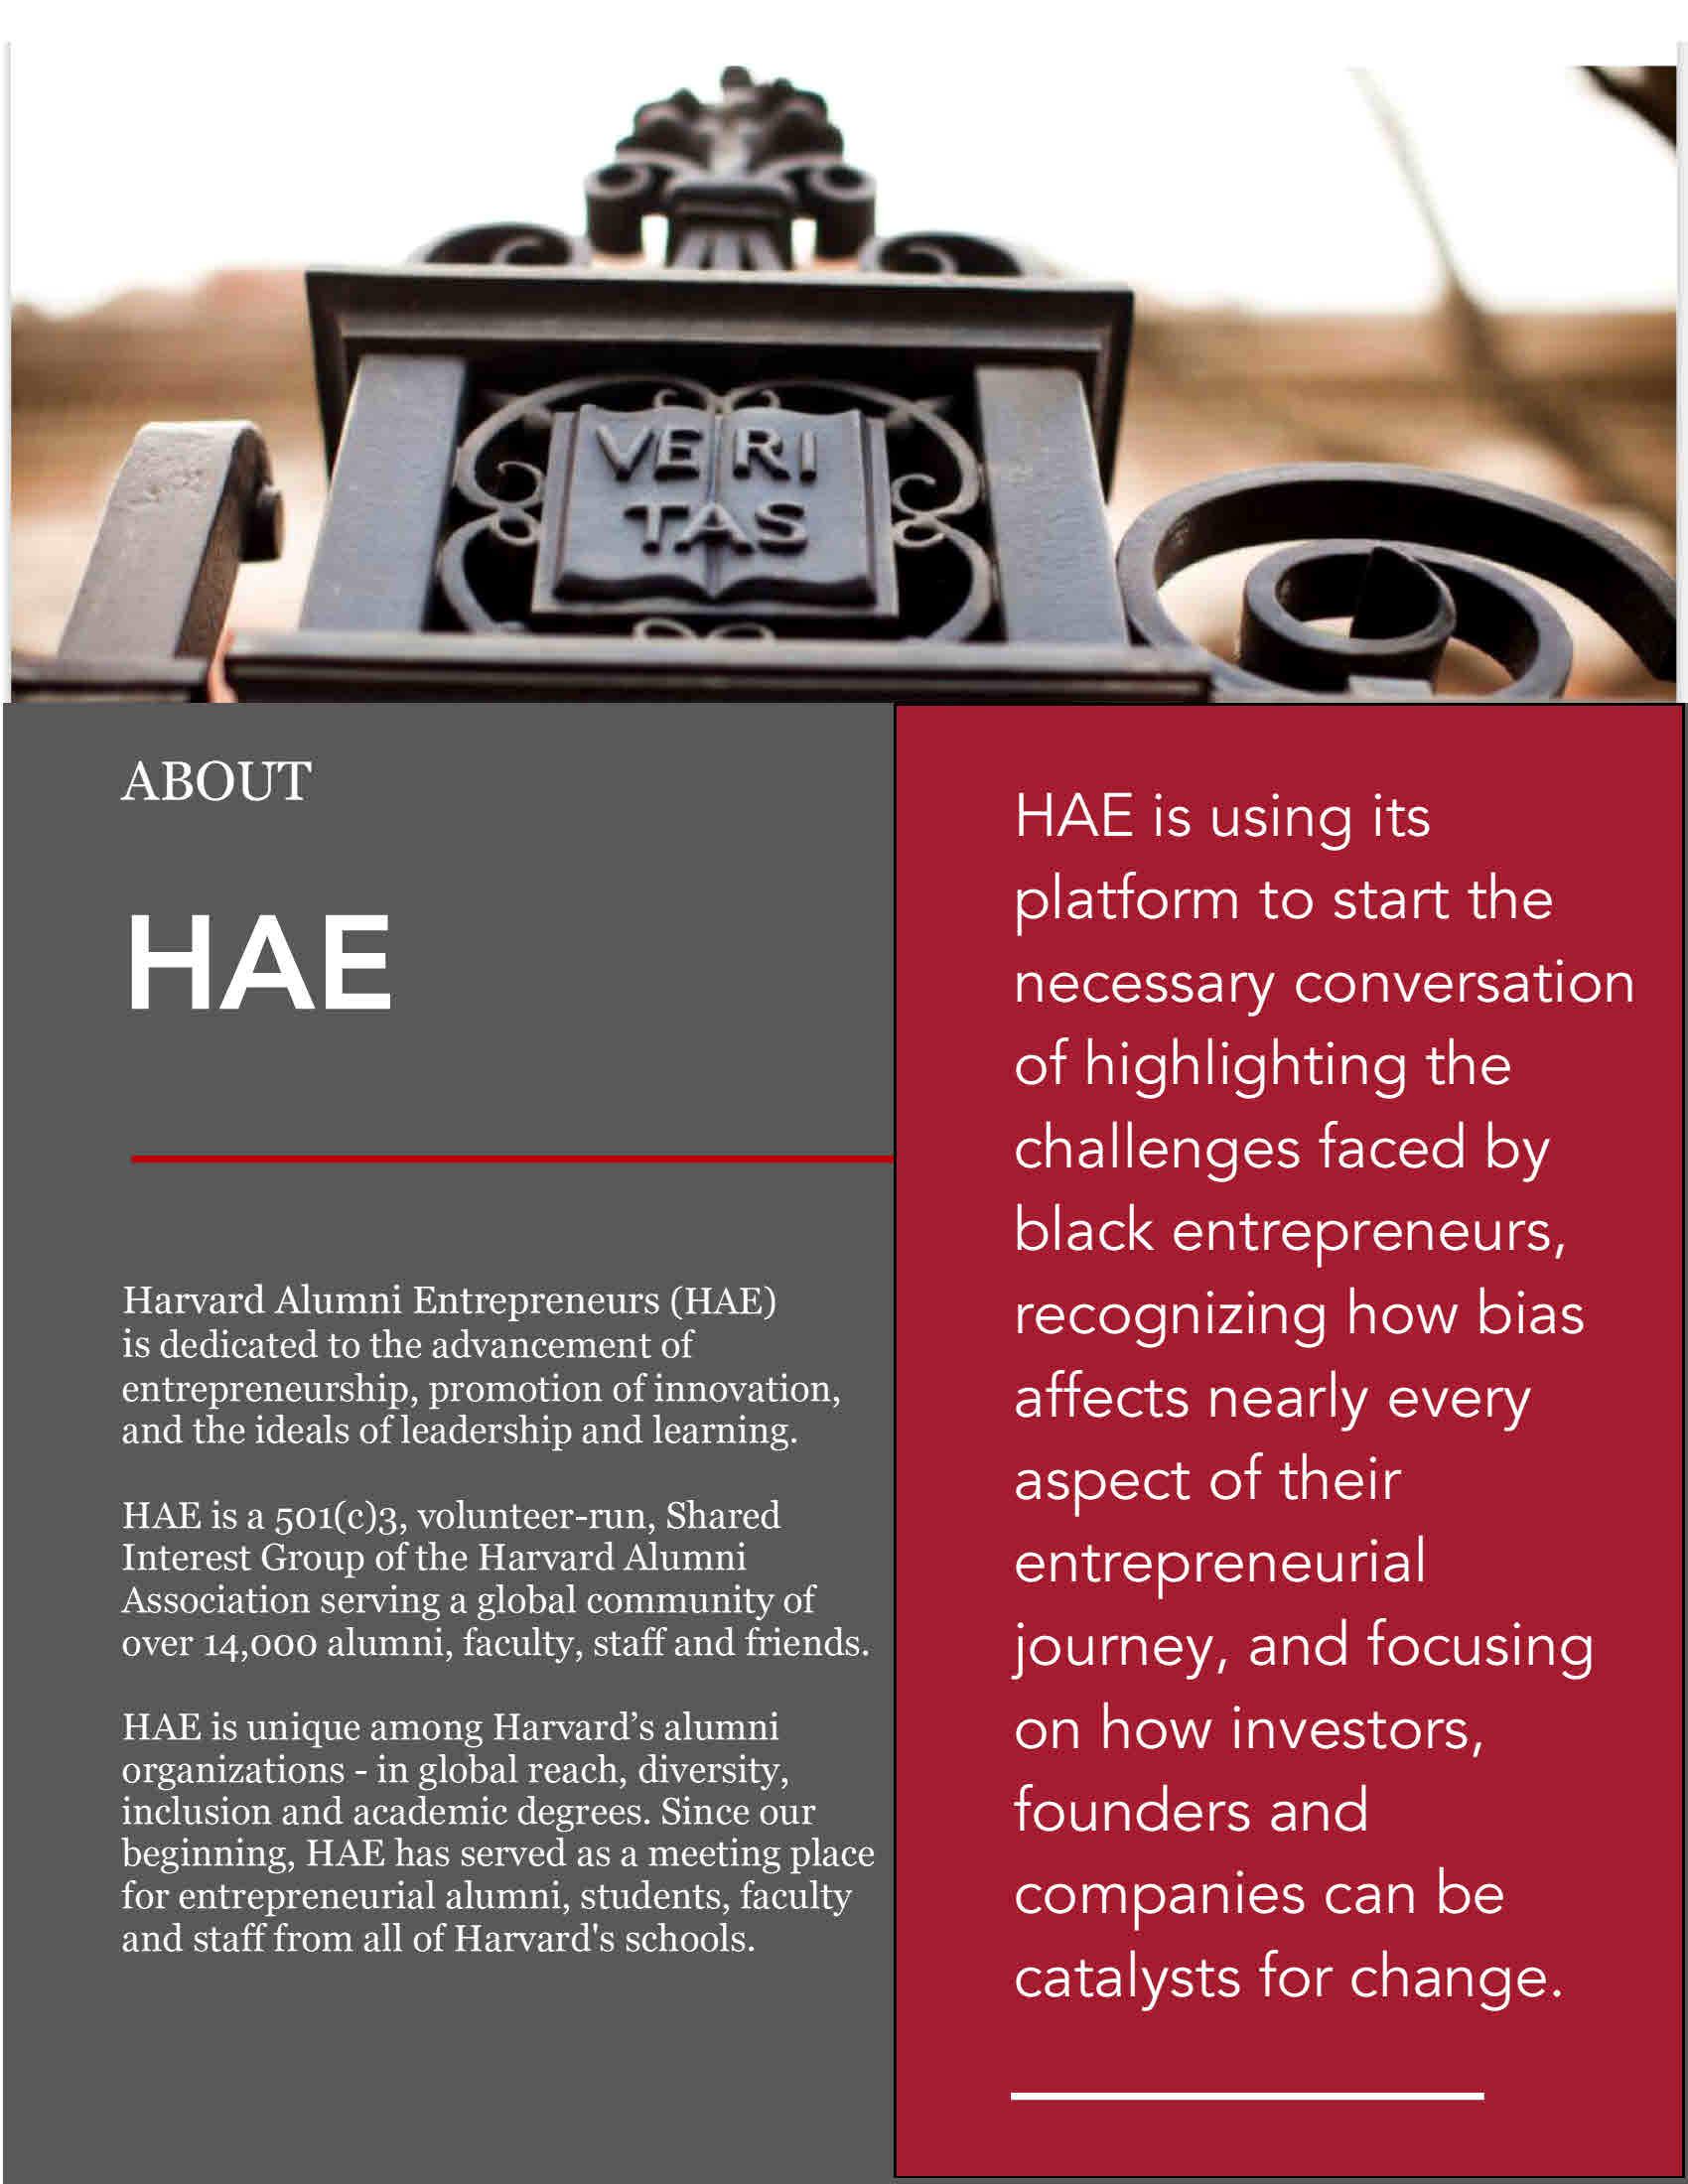 hae-advancing-diversity_overview_september-2020--3-